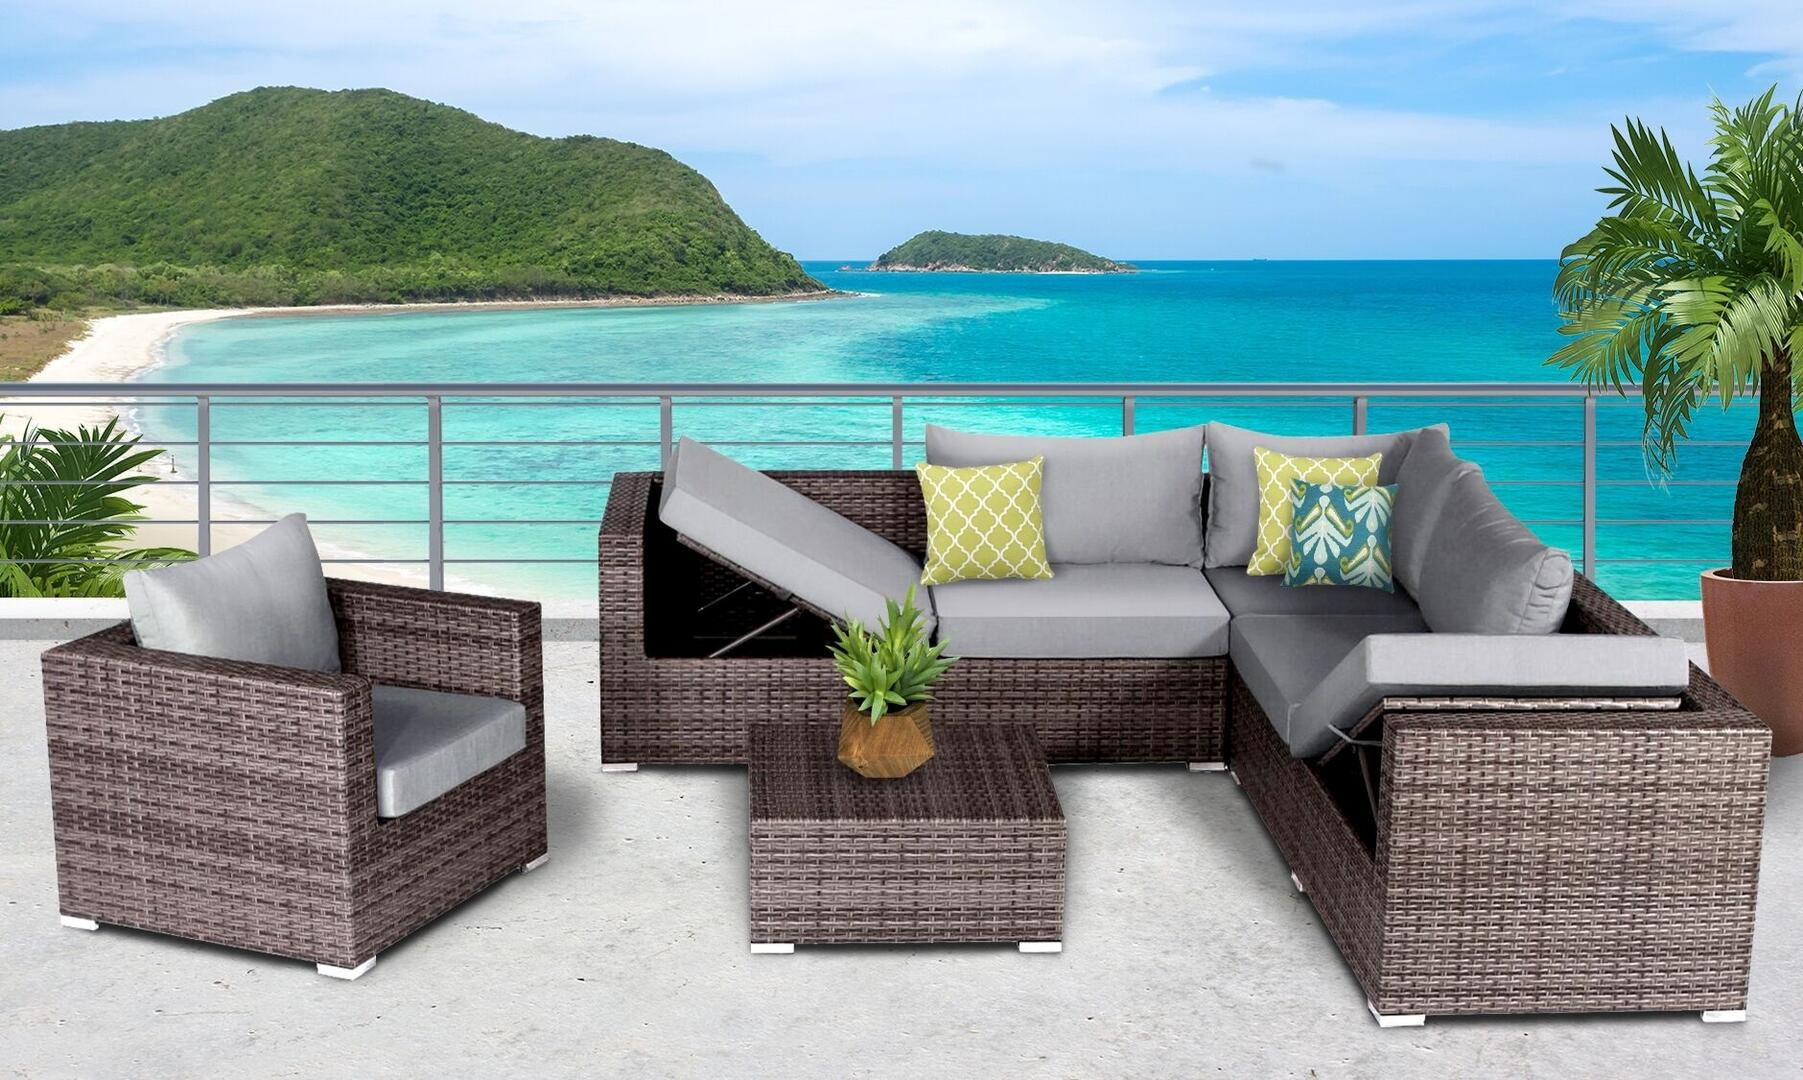 Miraculous Sunhaven Sun5001 Unemploymentrelief Wooden Chair Designs For Living Room Unemploymentrelieforg